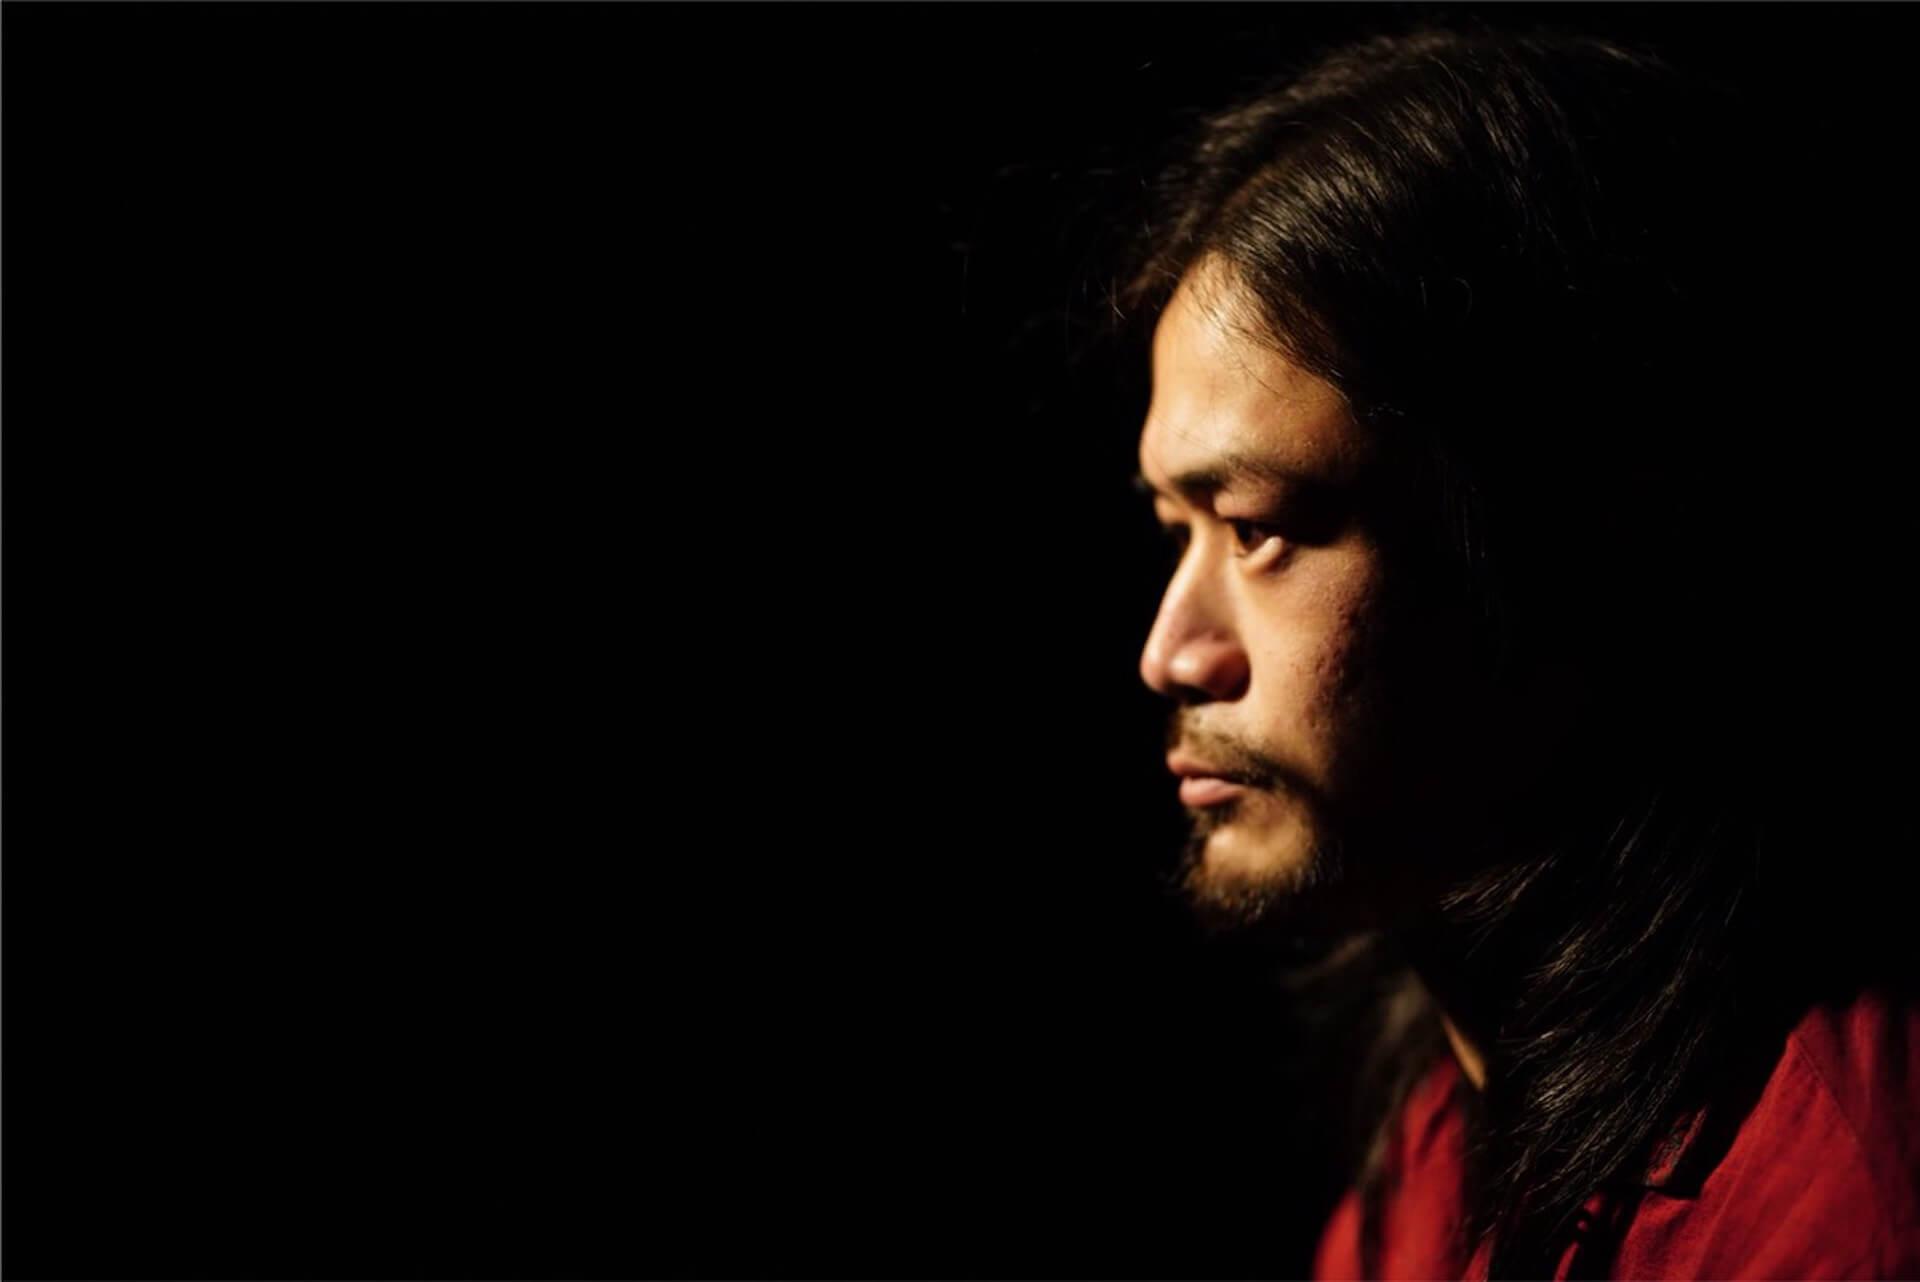 Yoshinori HayashiとDJ TODAYによるレジデントパーティーが美術家・村田峰紀を召喚し11月に開催 music191010-amygdala-moss-2